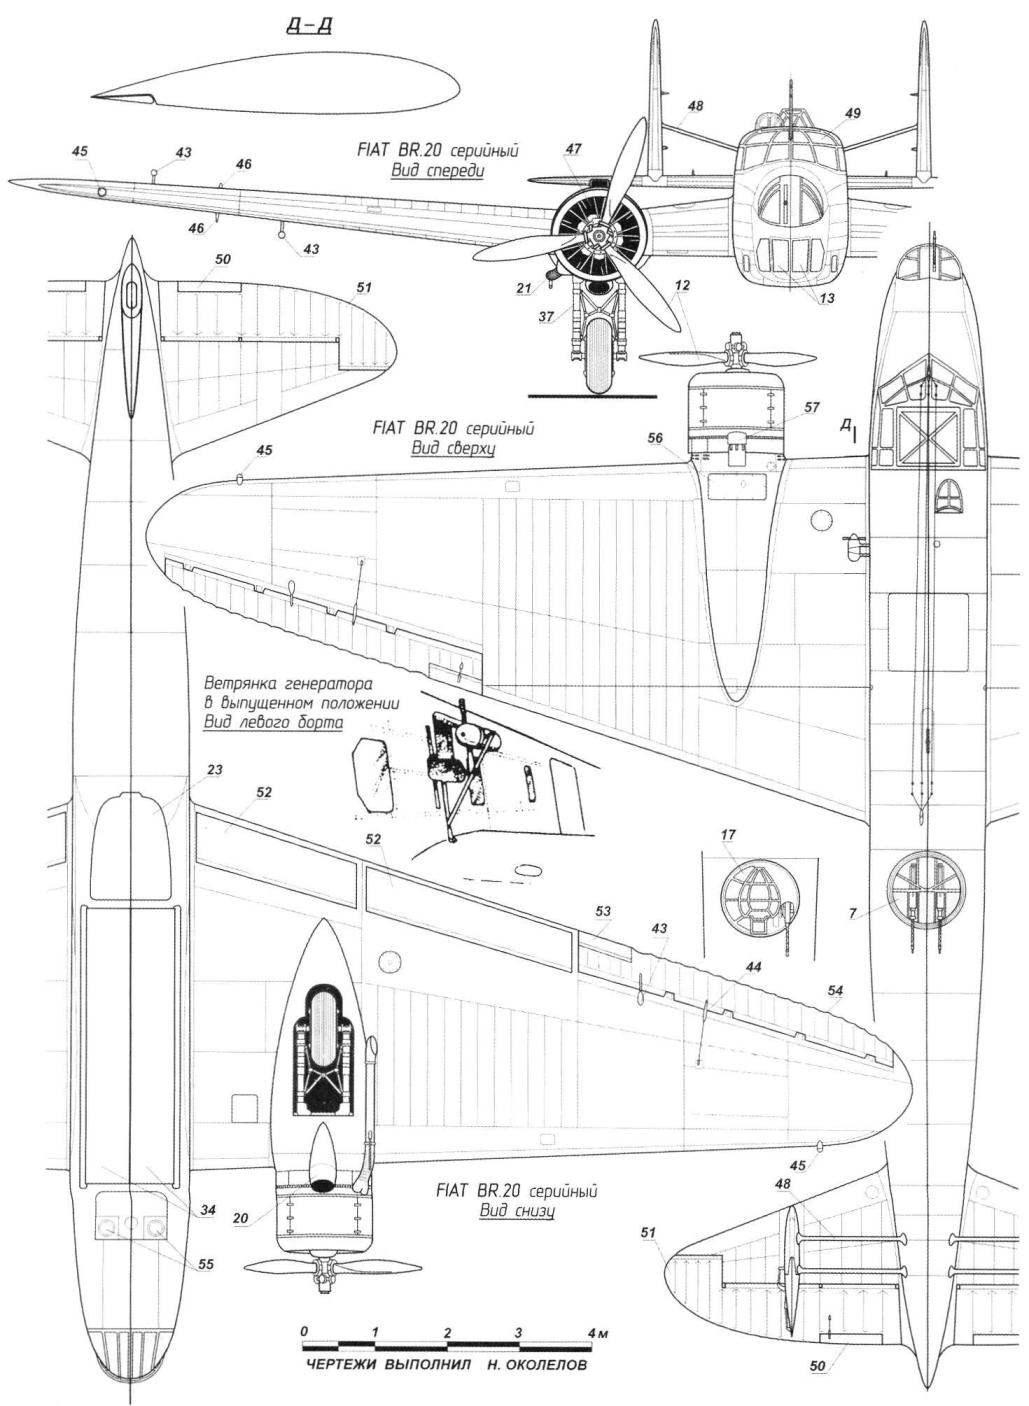 Бомбардировщик FIAT BR.20